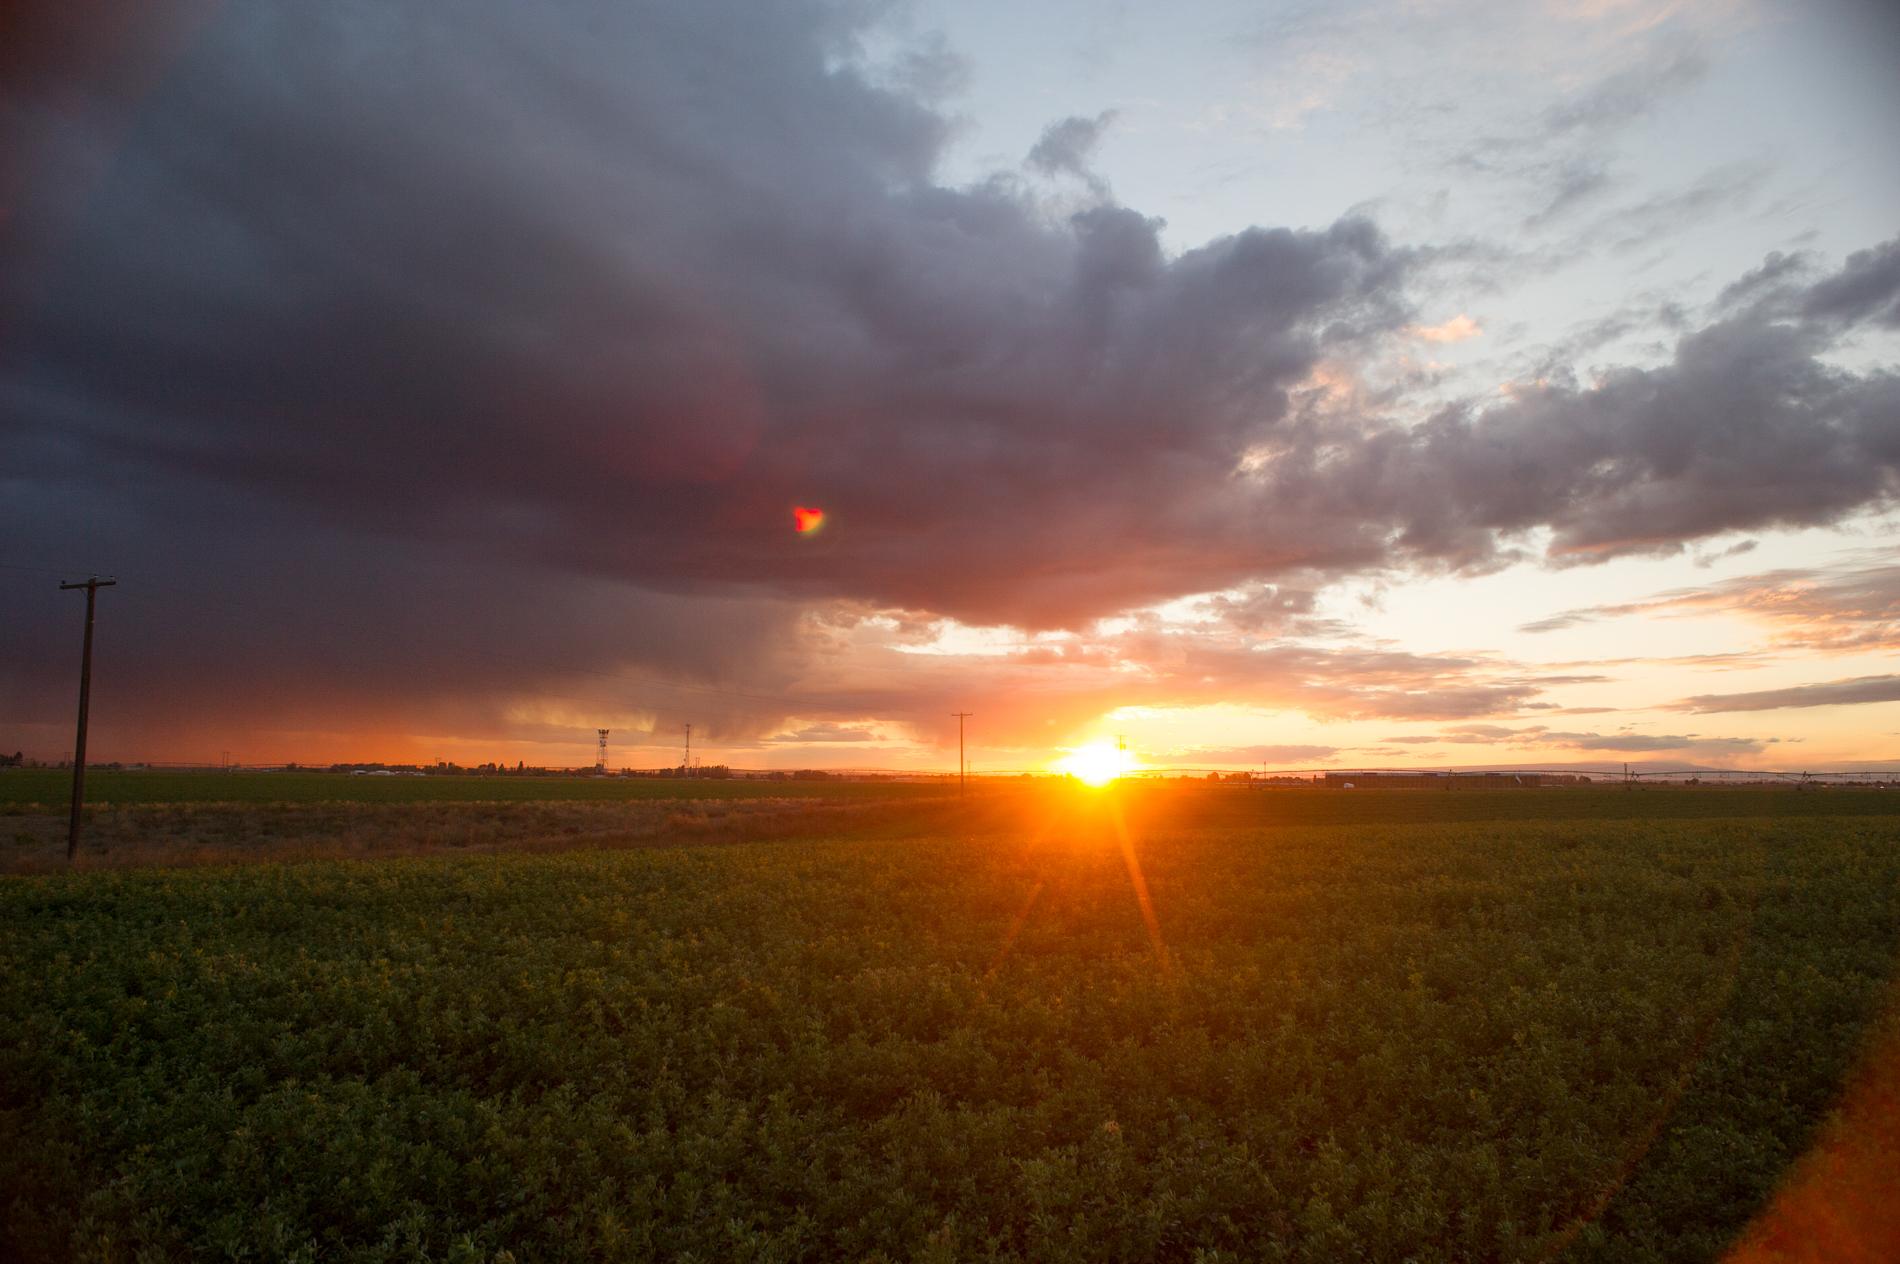 Sunset over Alfalfa